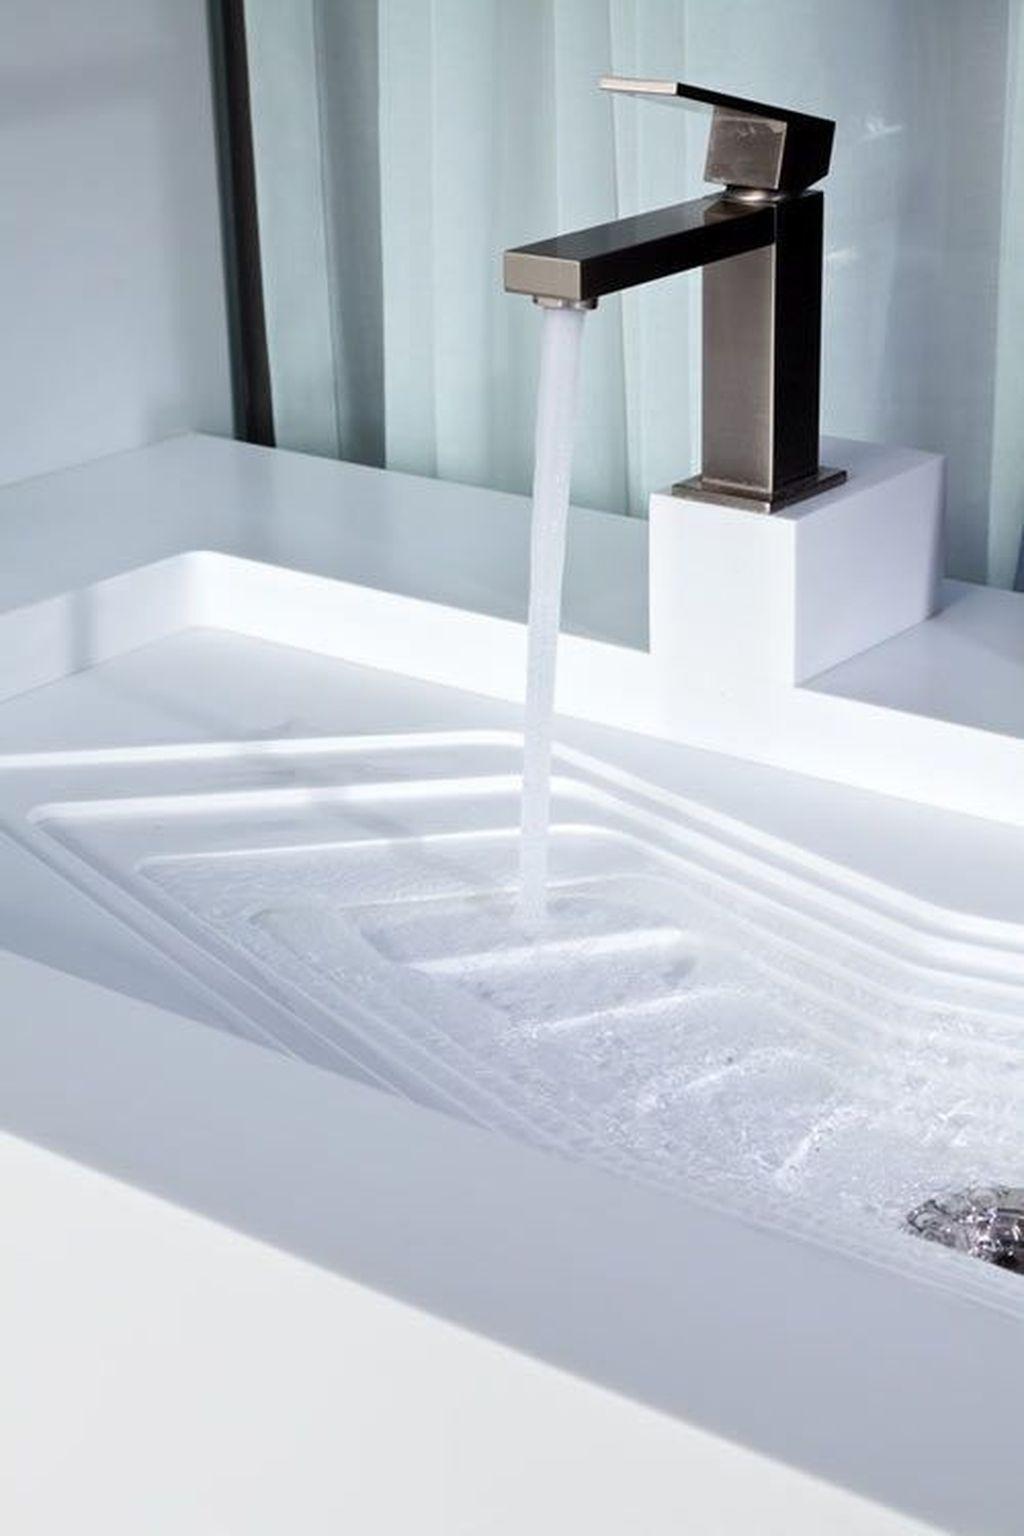 Enchanting Sink Design Ideas That Inspiring In This Year 26